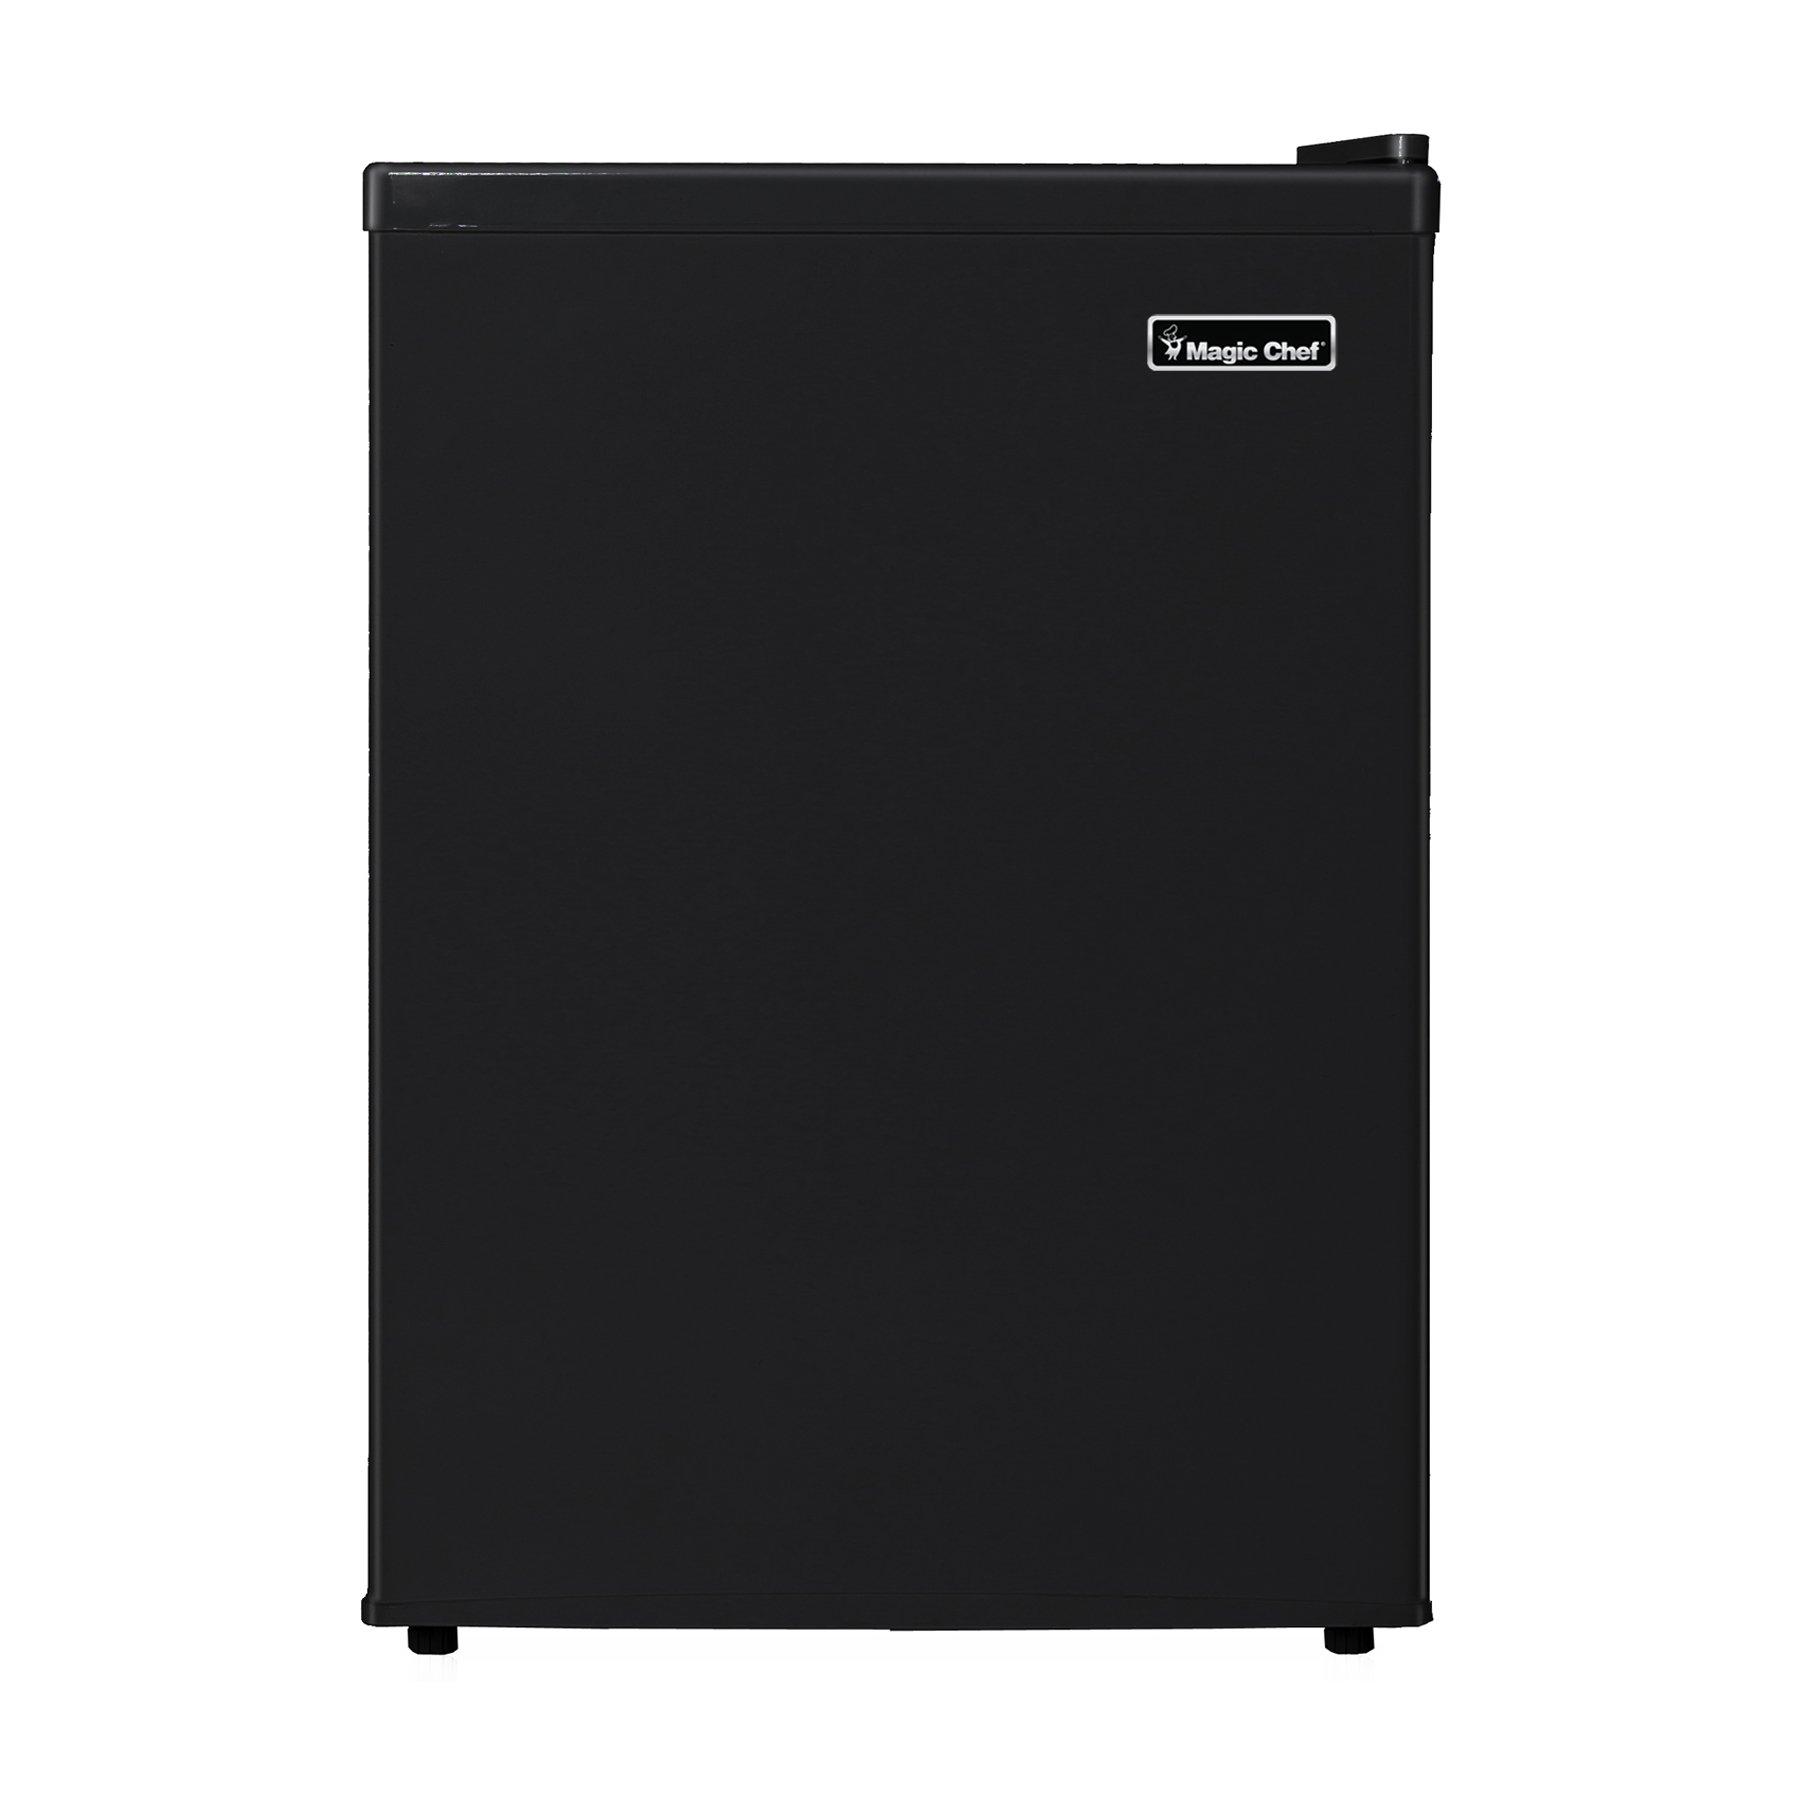 Magic Chef MCBR240B1 Refrigerator, 2.4 cu. ft, Black by Magic Chef